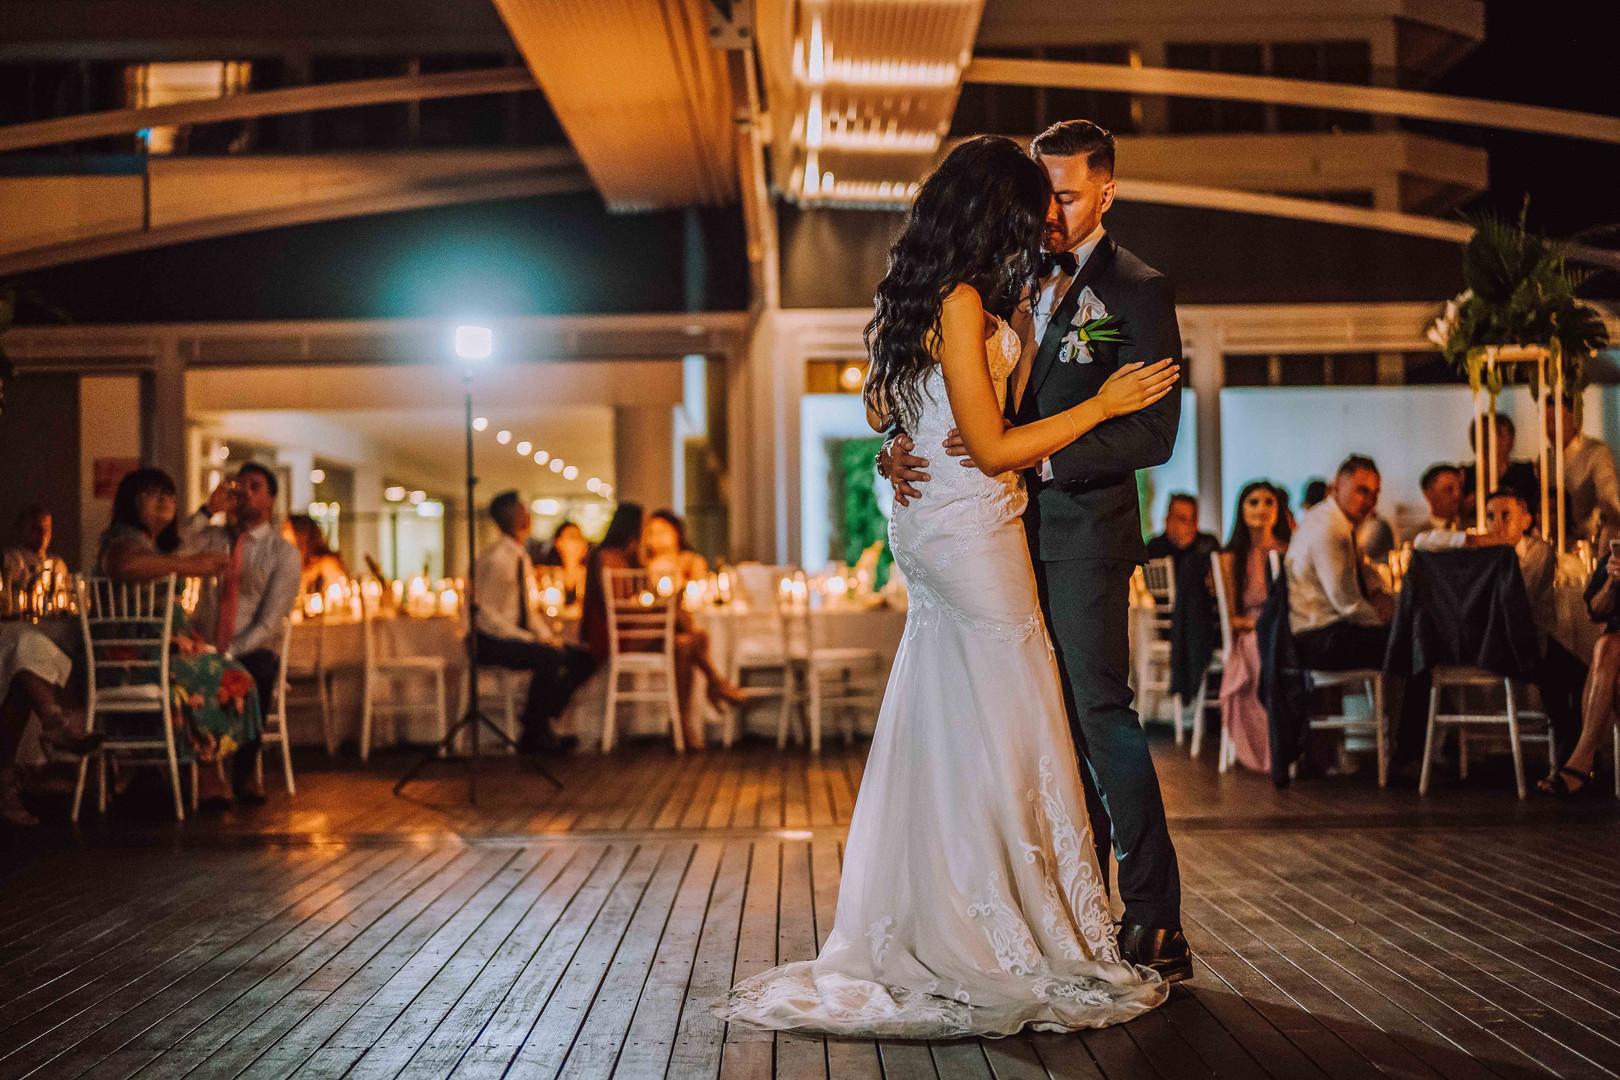 WeddingWebsite_Compressed_A2-28.jpg